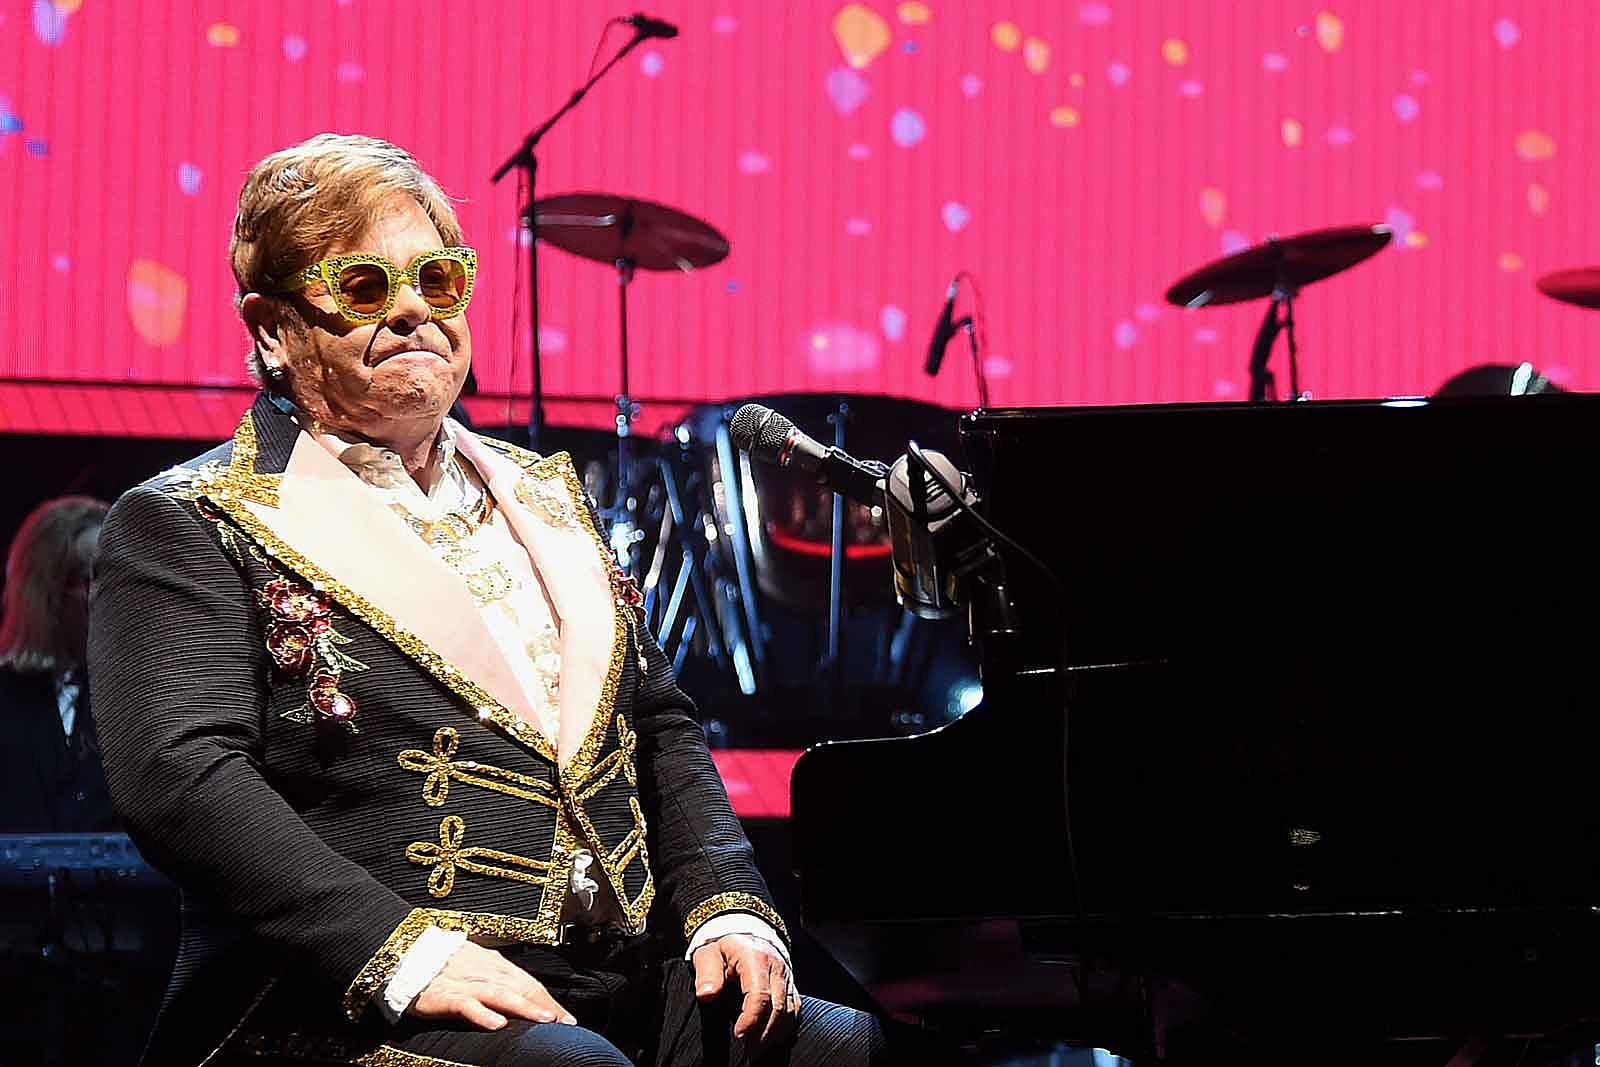 Elton John Wrote Memoir to Document 'Ridiculous' Life